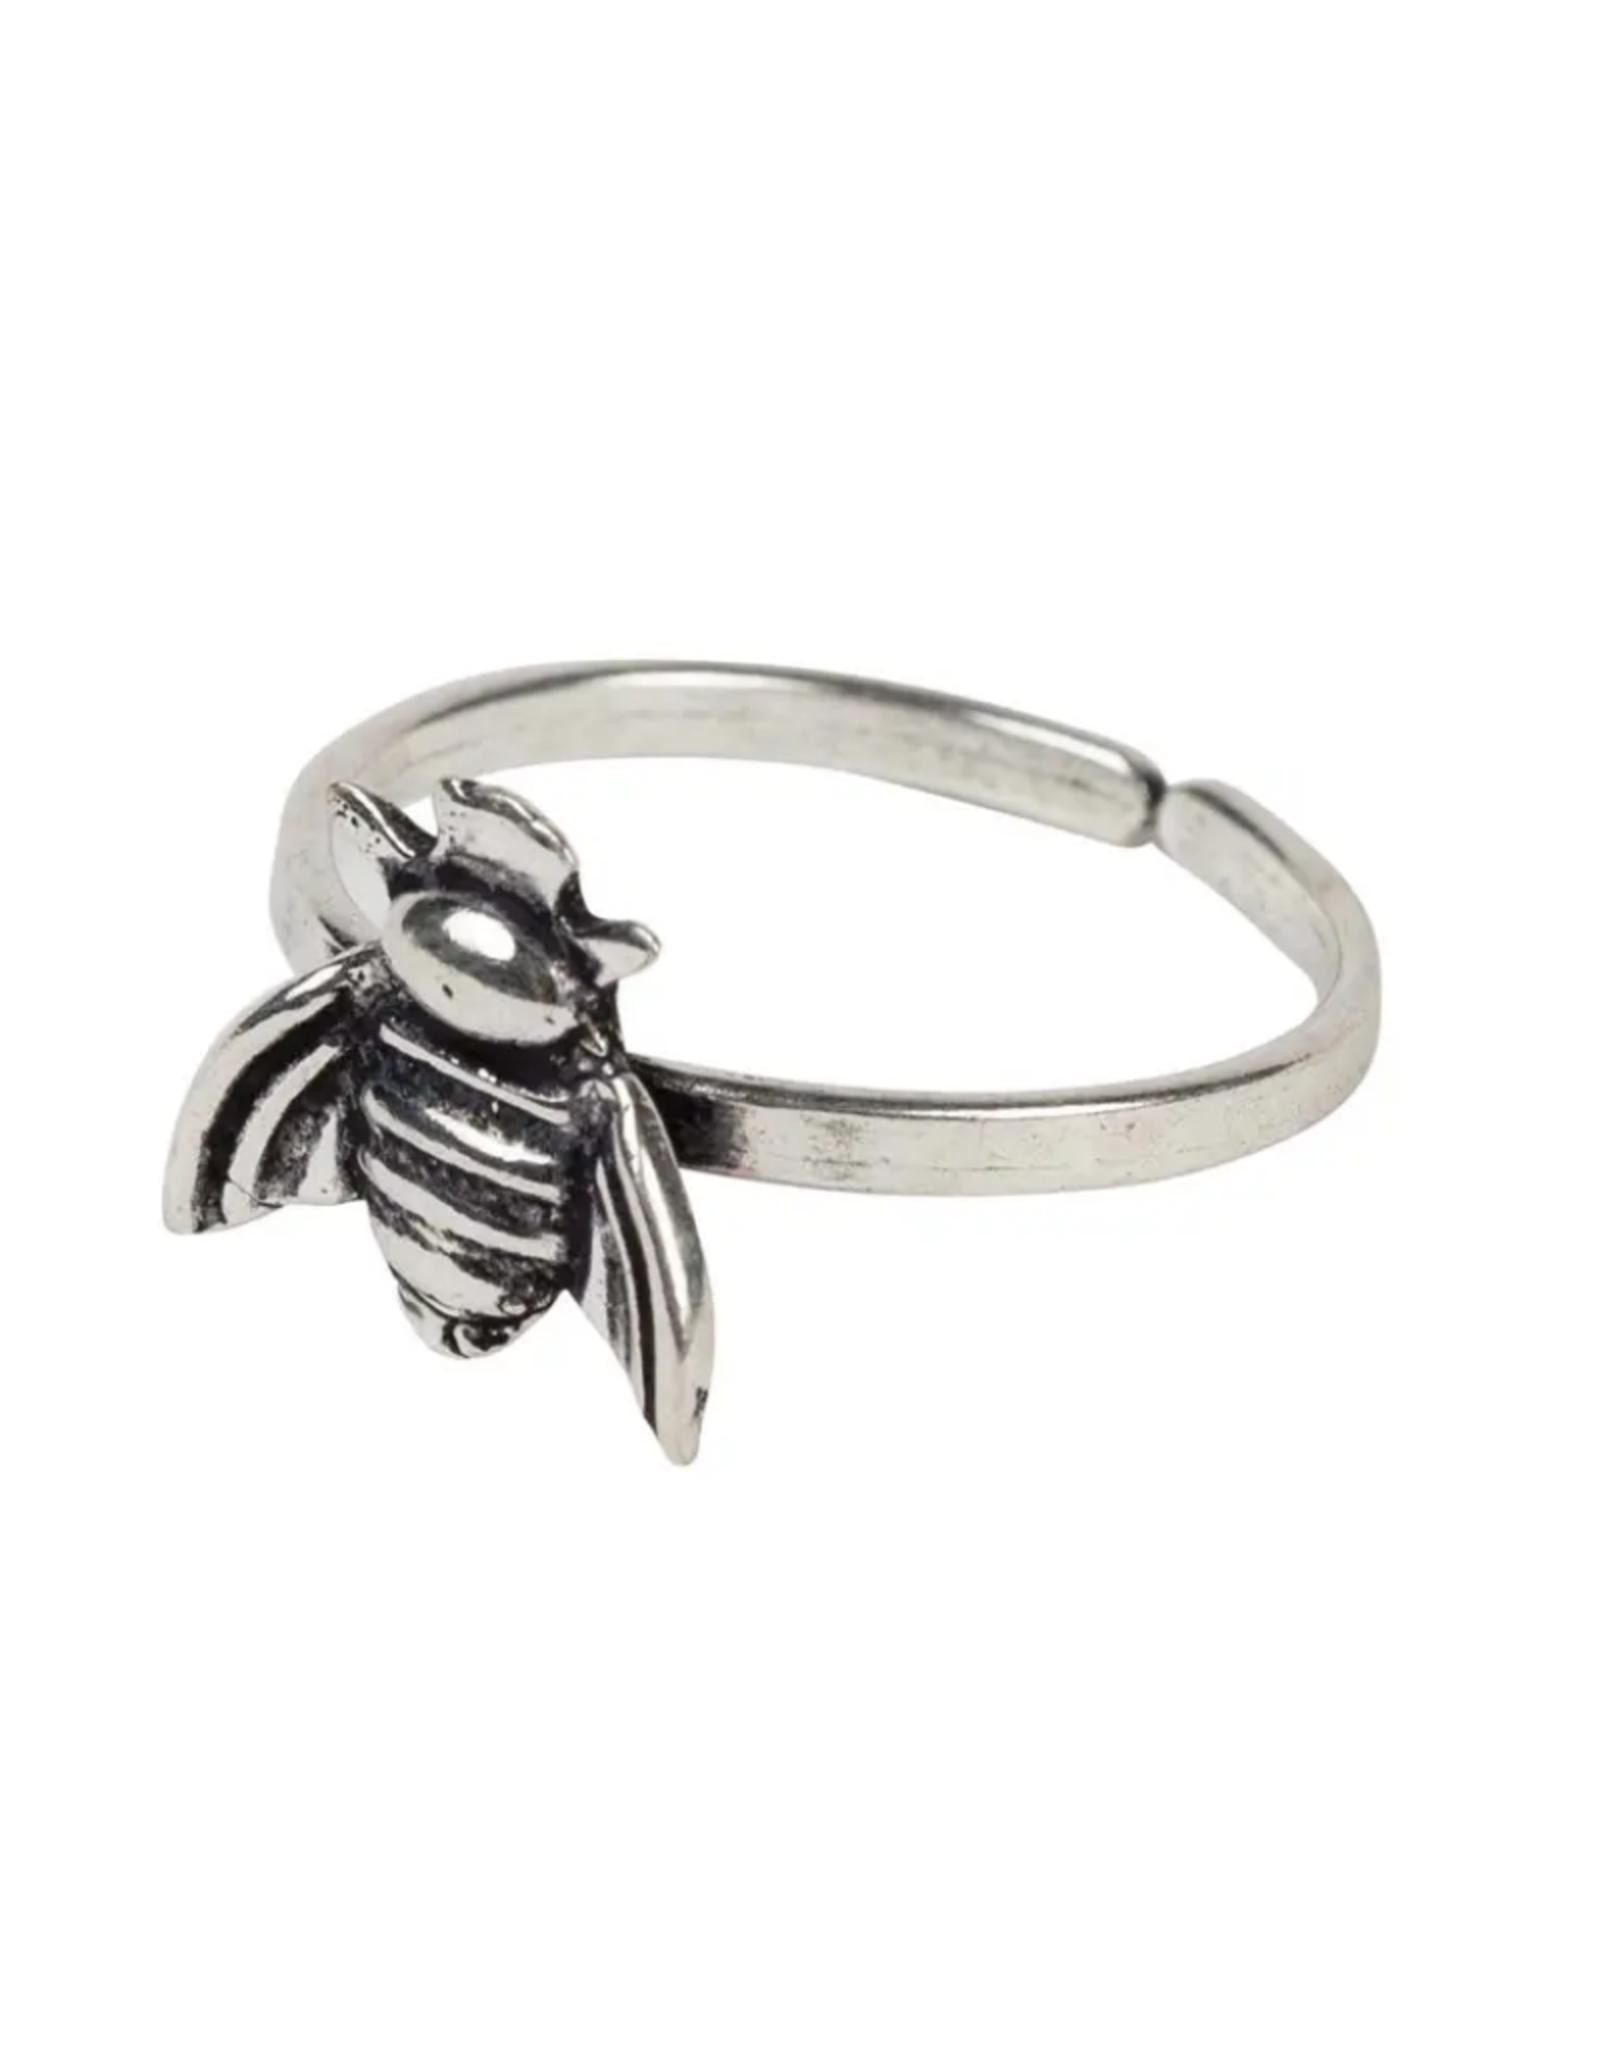 TTV USA Ring, Bumblebee